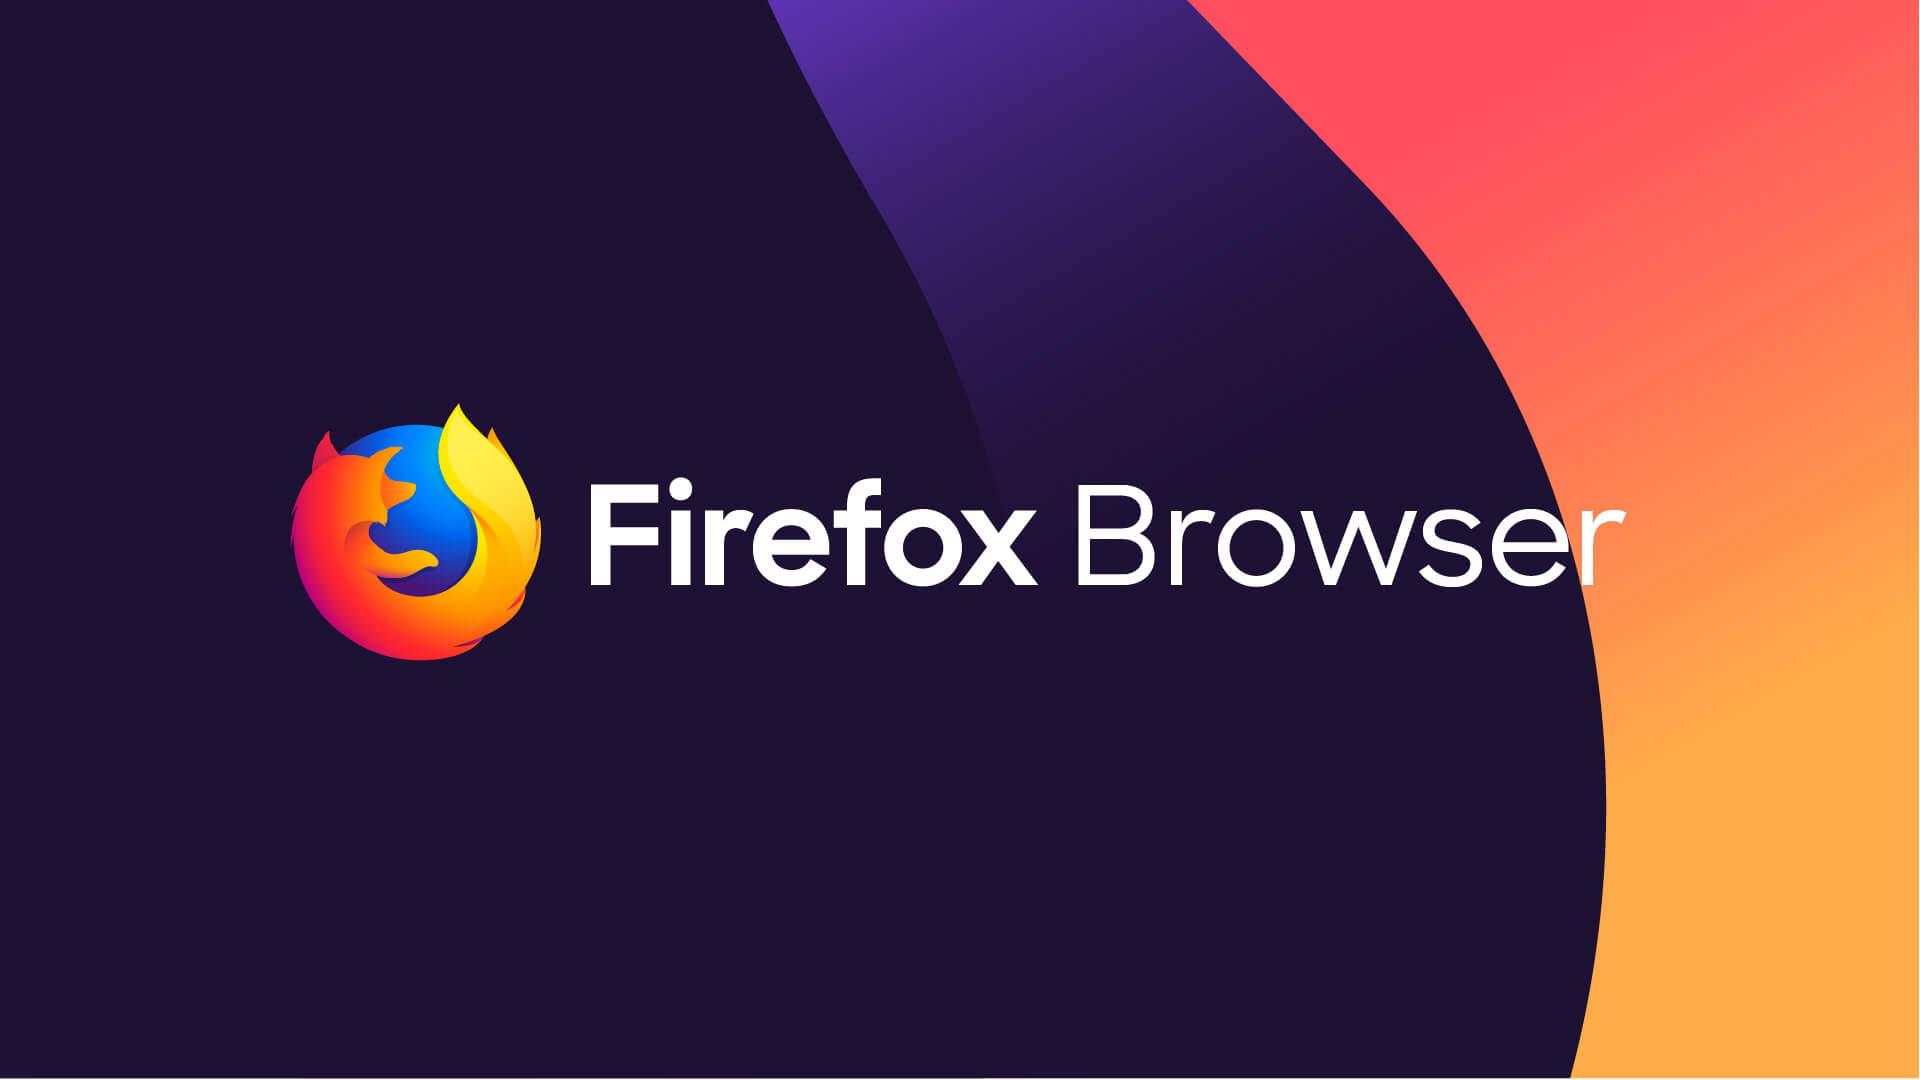 Logo do firefox browser